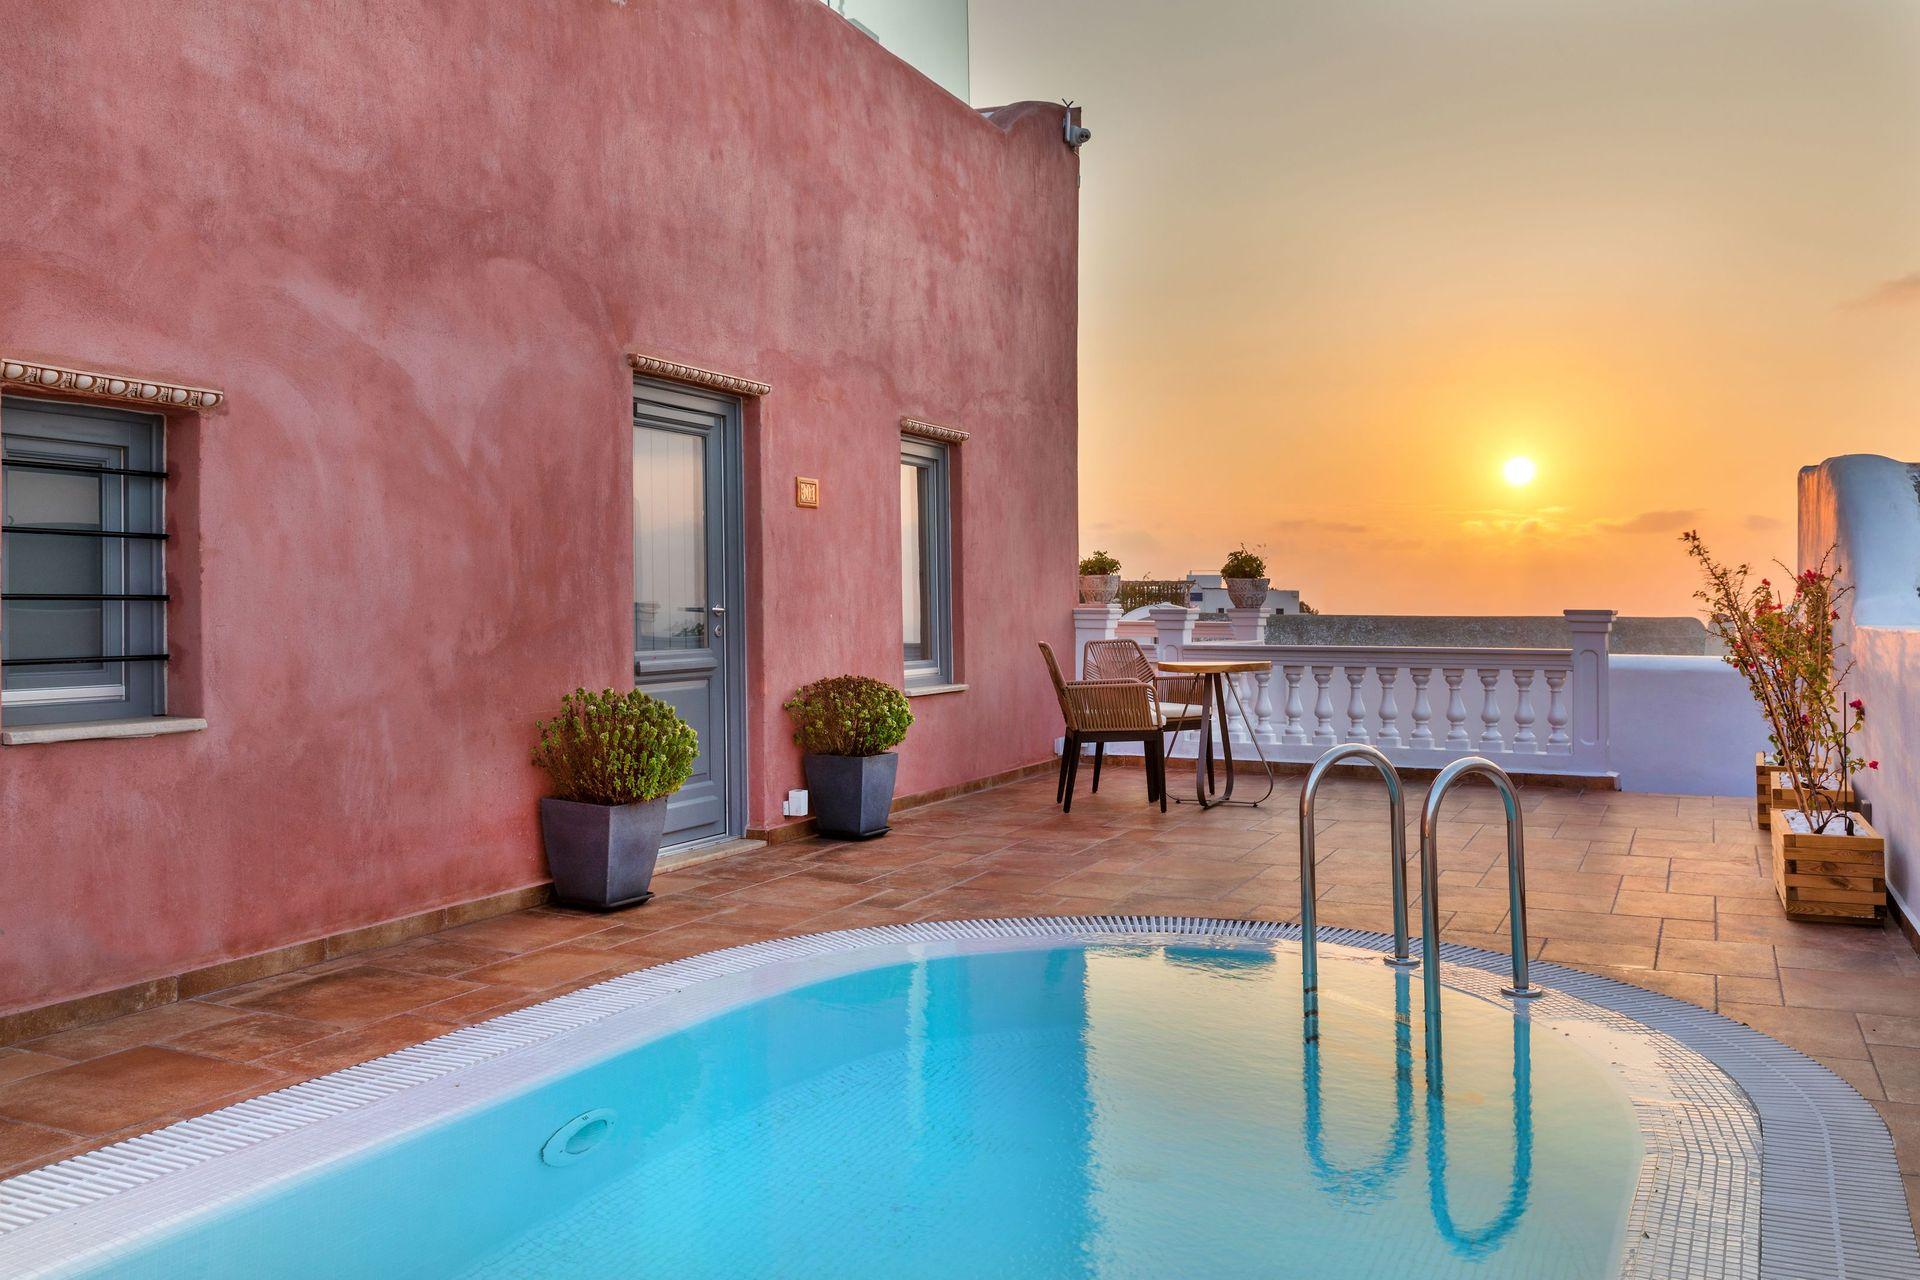 Tramonto Secret Villas - Σαντορίνη ✦ 2 Ημέρες (1 Διανυκτέρευση) ✦ 2 άτομα ✦ Πρωινό ✦ 10/07/2020 έως 30/09/2020 ✦ Υπέροχη Τοποθεσία!